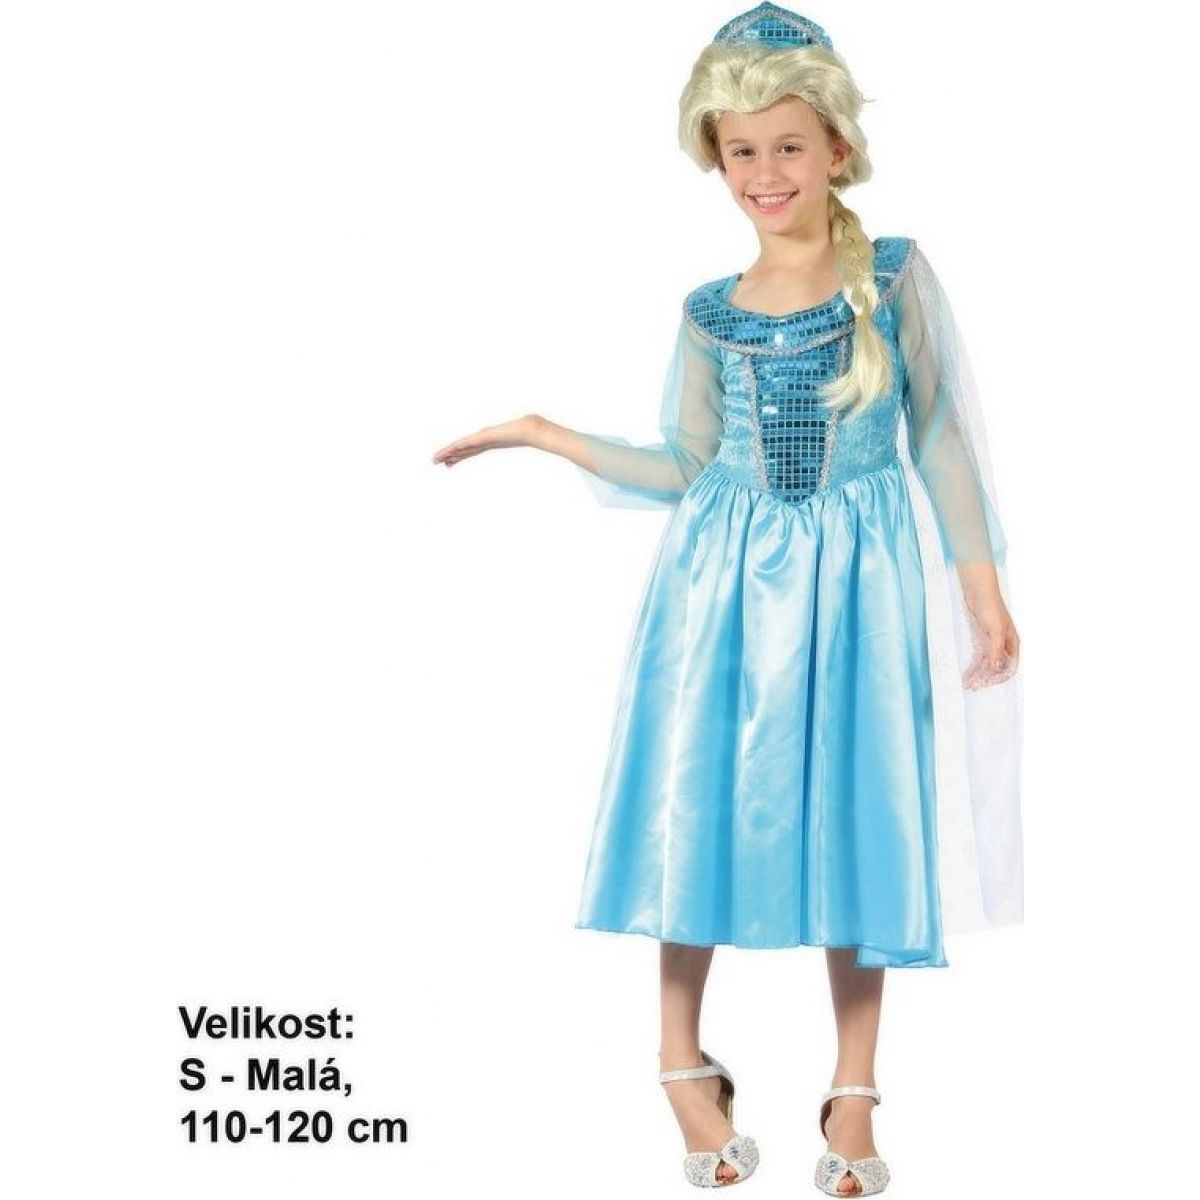 Made Dětský karnevalový kostým Ledová princezna 110 - 120 cm